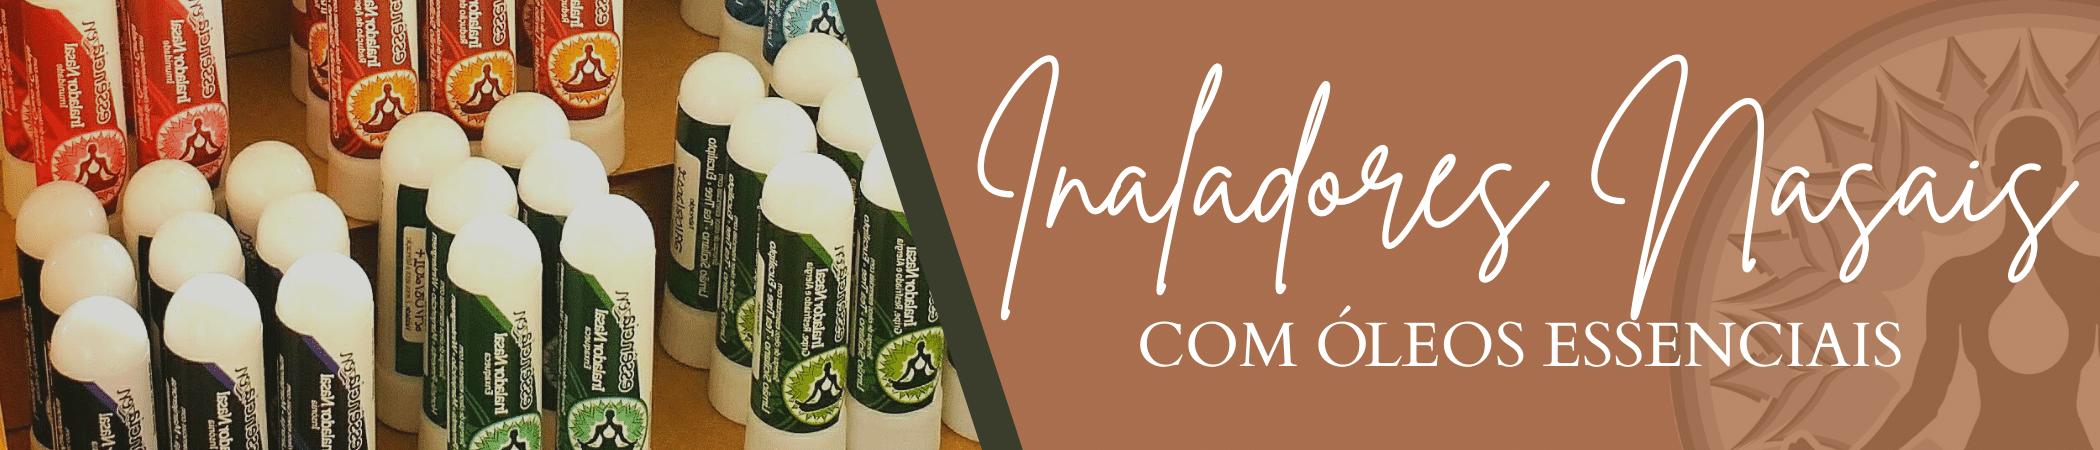 Banner Inaladores